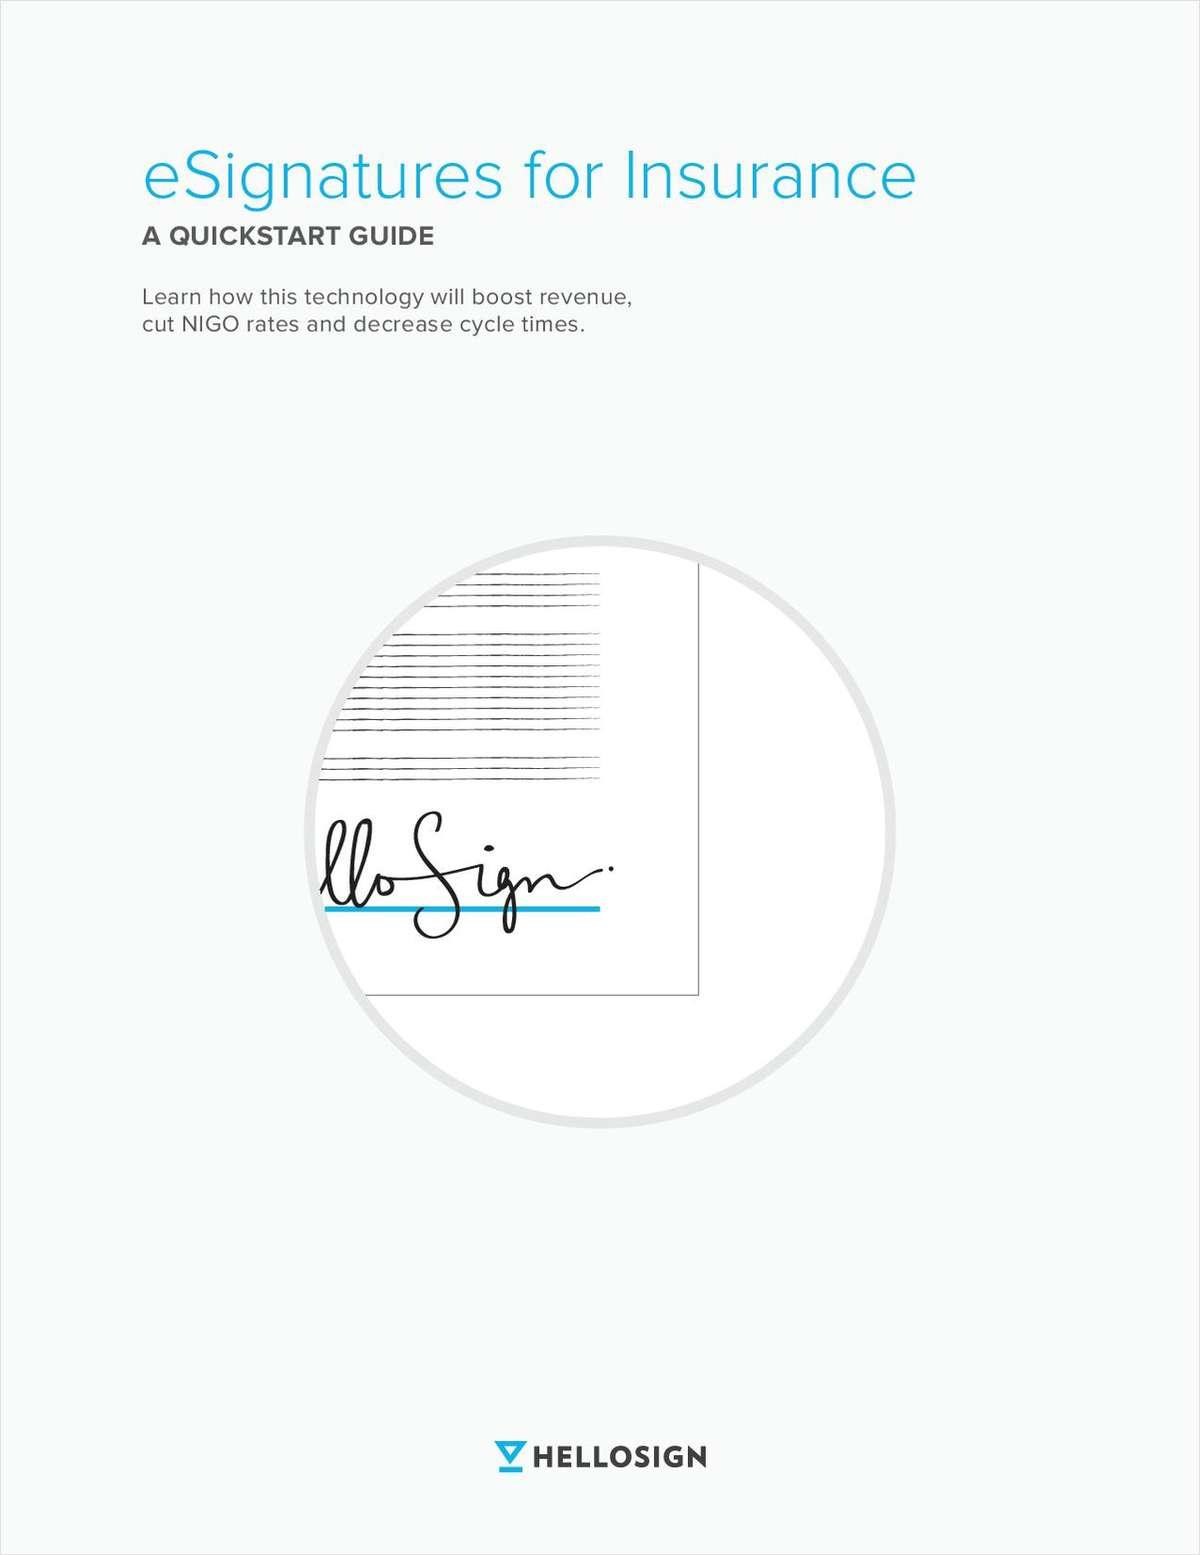 A Quickstart Guide: eSignatures for Insurance